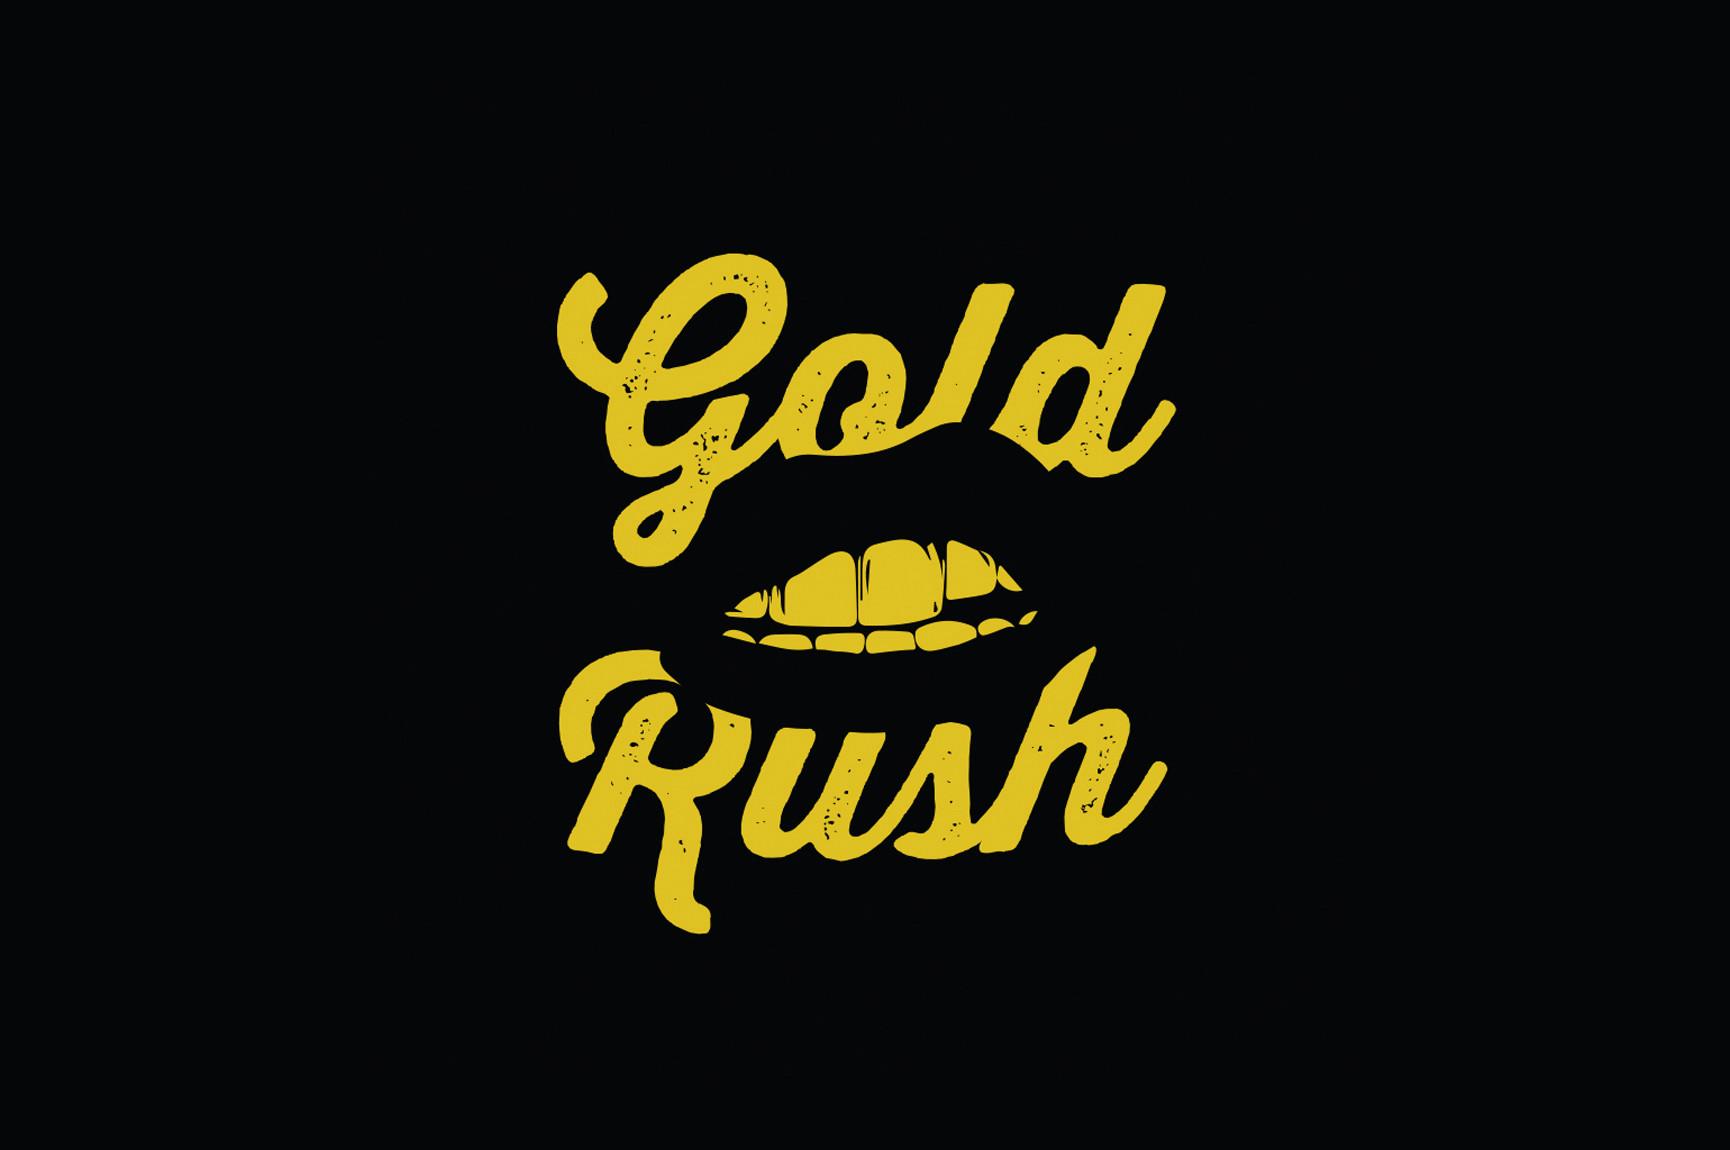 GoldRush04.jpg